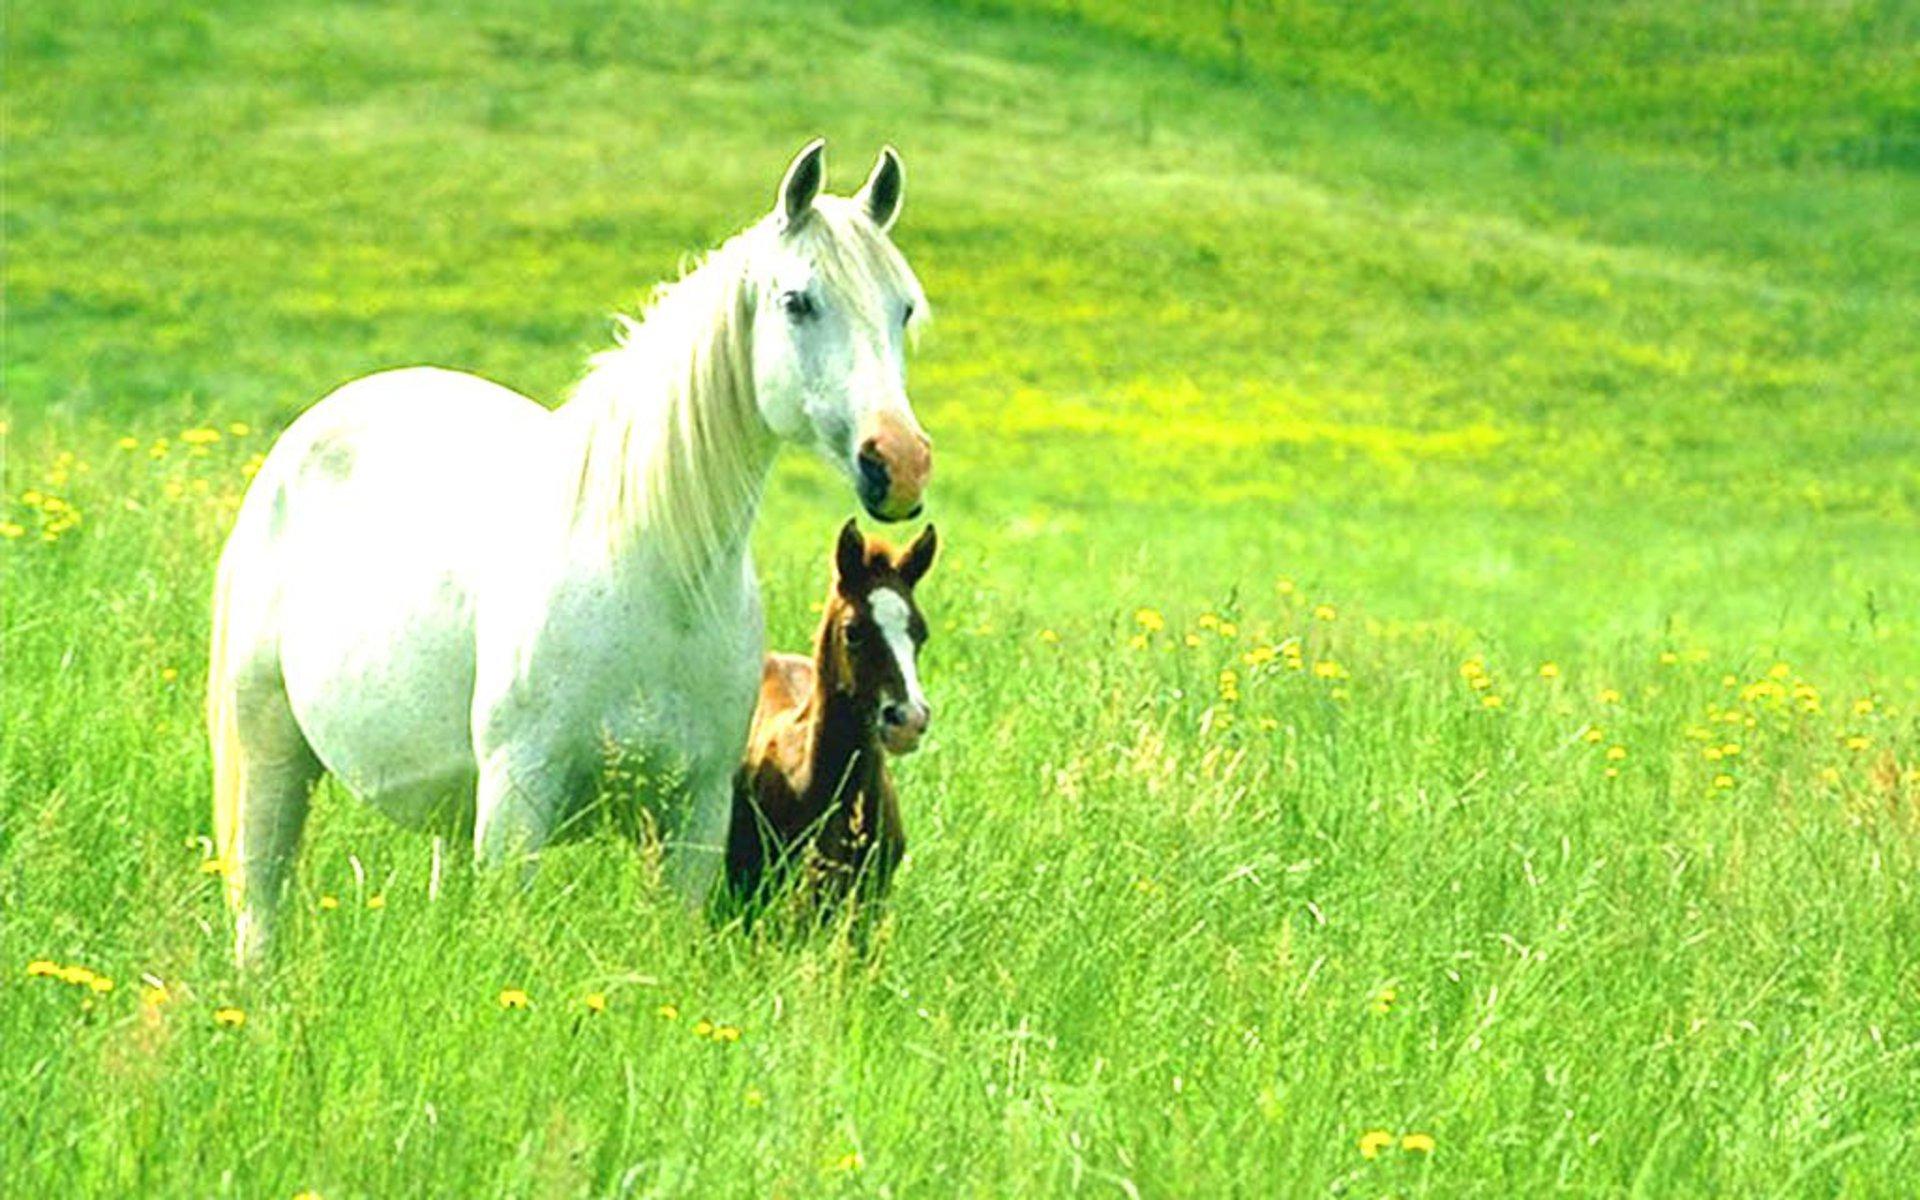 animals-wallpapers-desktop-wallpaper-mac-horses-about-wildlife-background-ponies-apple.jpg